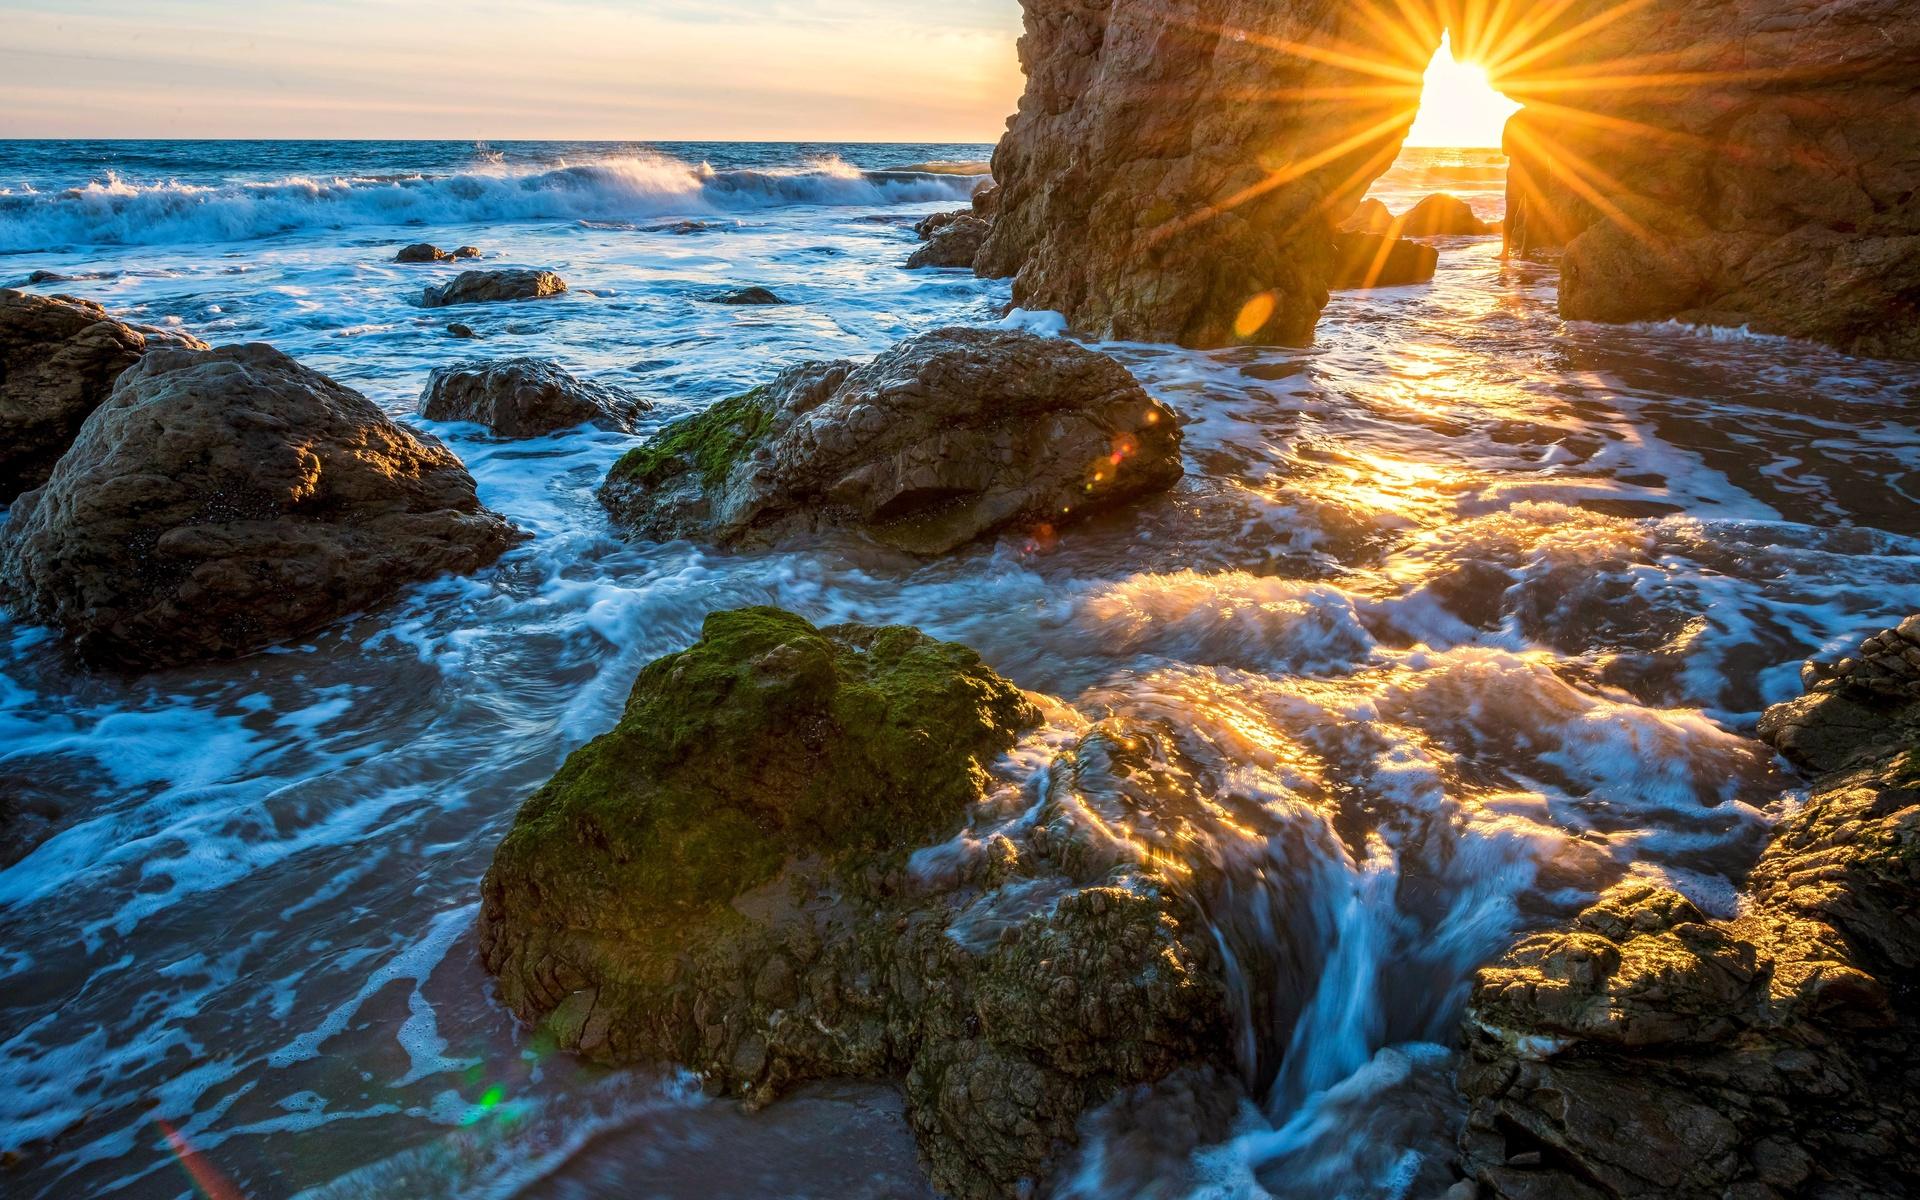 природа, берег, море, солнце, закат, небо, лучи, арка, камни, закат, малибу, пляж эль матадор, фотограф dr. elliot